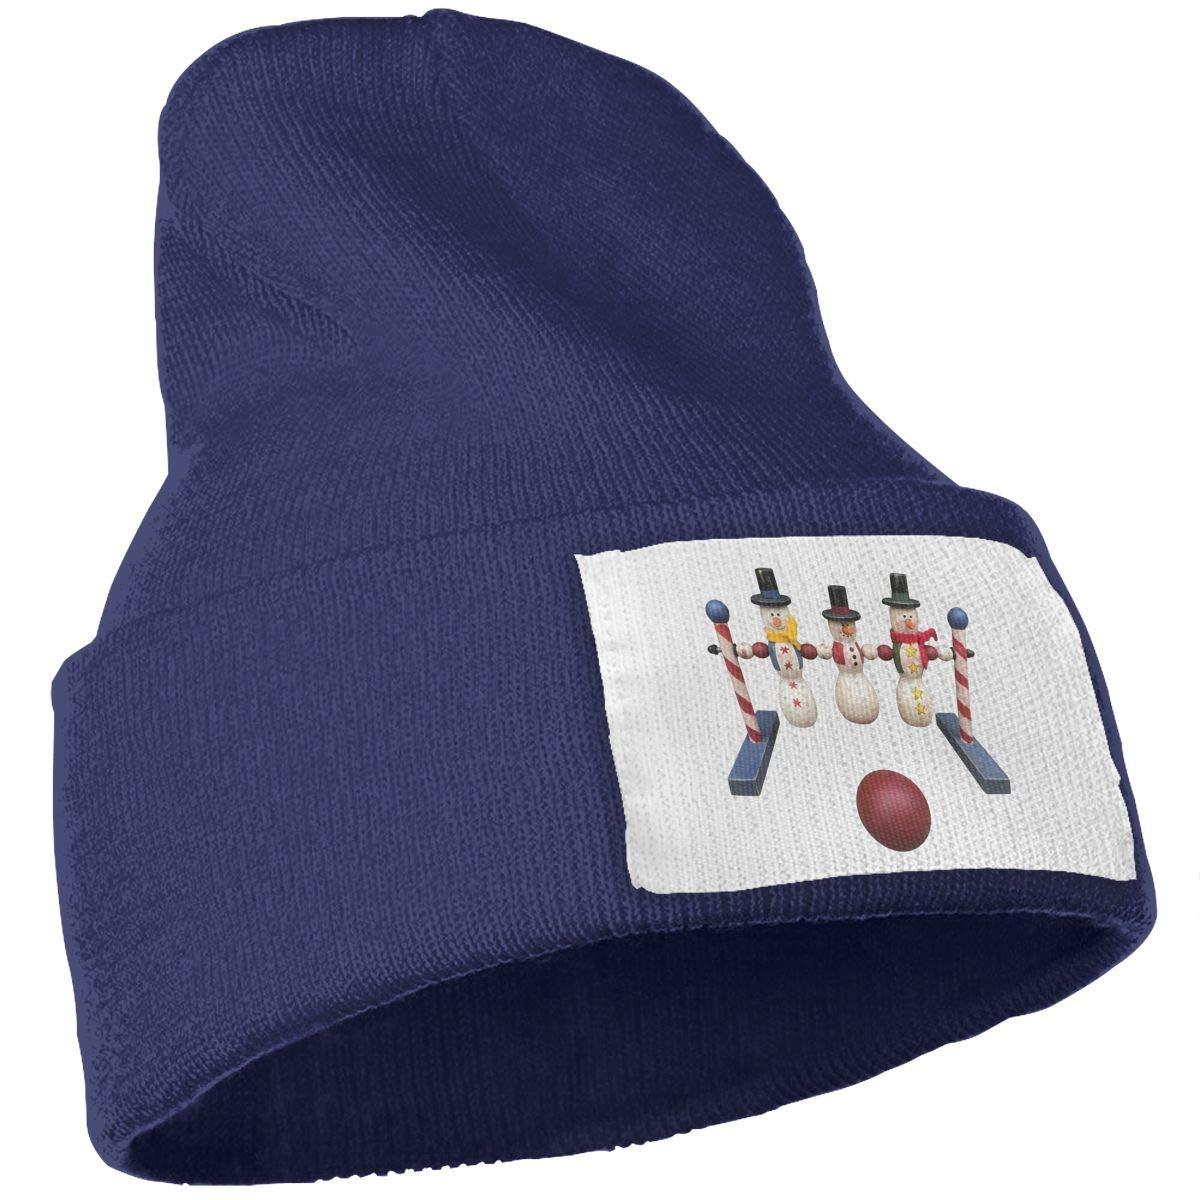 QZqDQ Bowling Unisex Fashion Knitted Hat Luxury Hip-Hop Cap